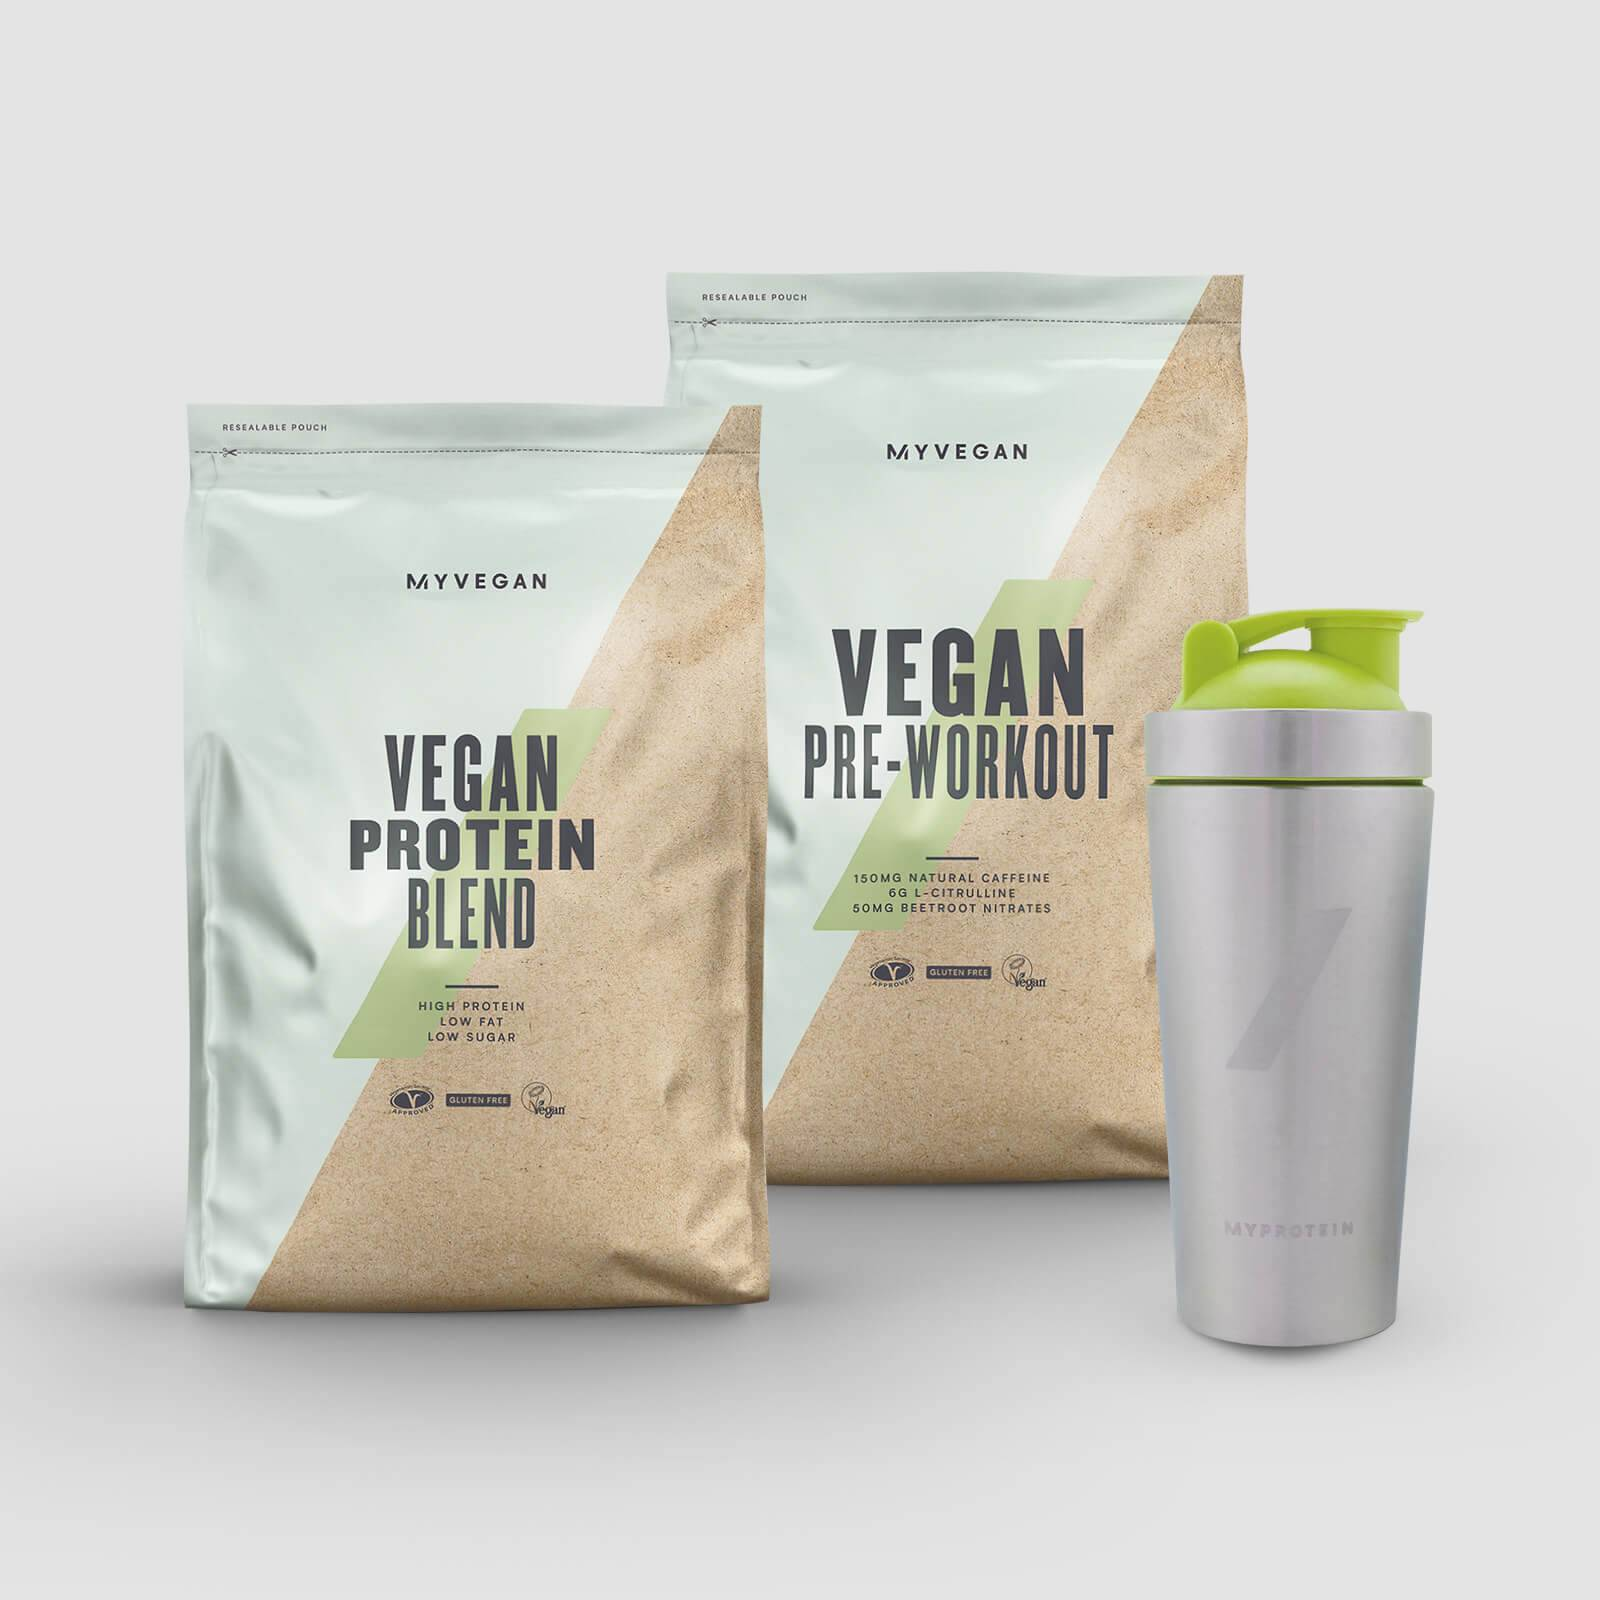 Pack performance vegan - Sour Apple - Turmeric Latte